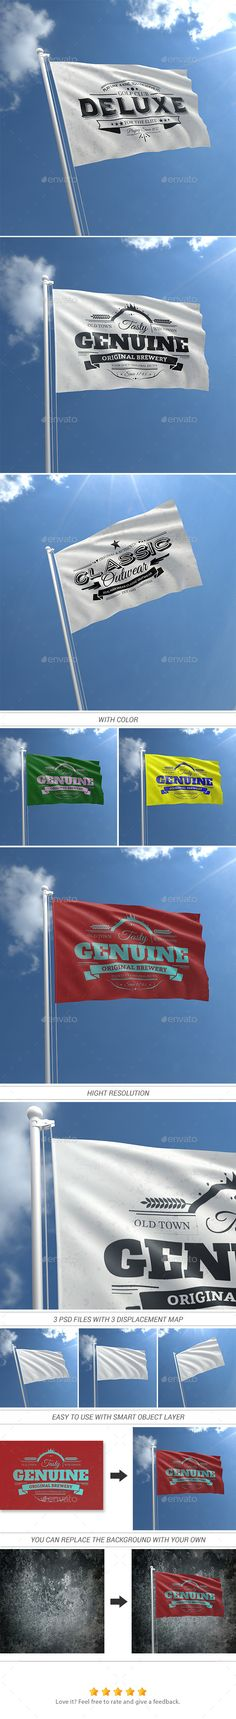 Realistic Flag Mock-Ups #flagmockup #design Download: http://graphicriver.net/item/realistic-flag-mockups/11594872?ref=ksioks